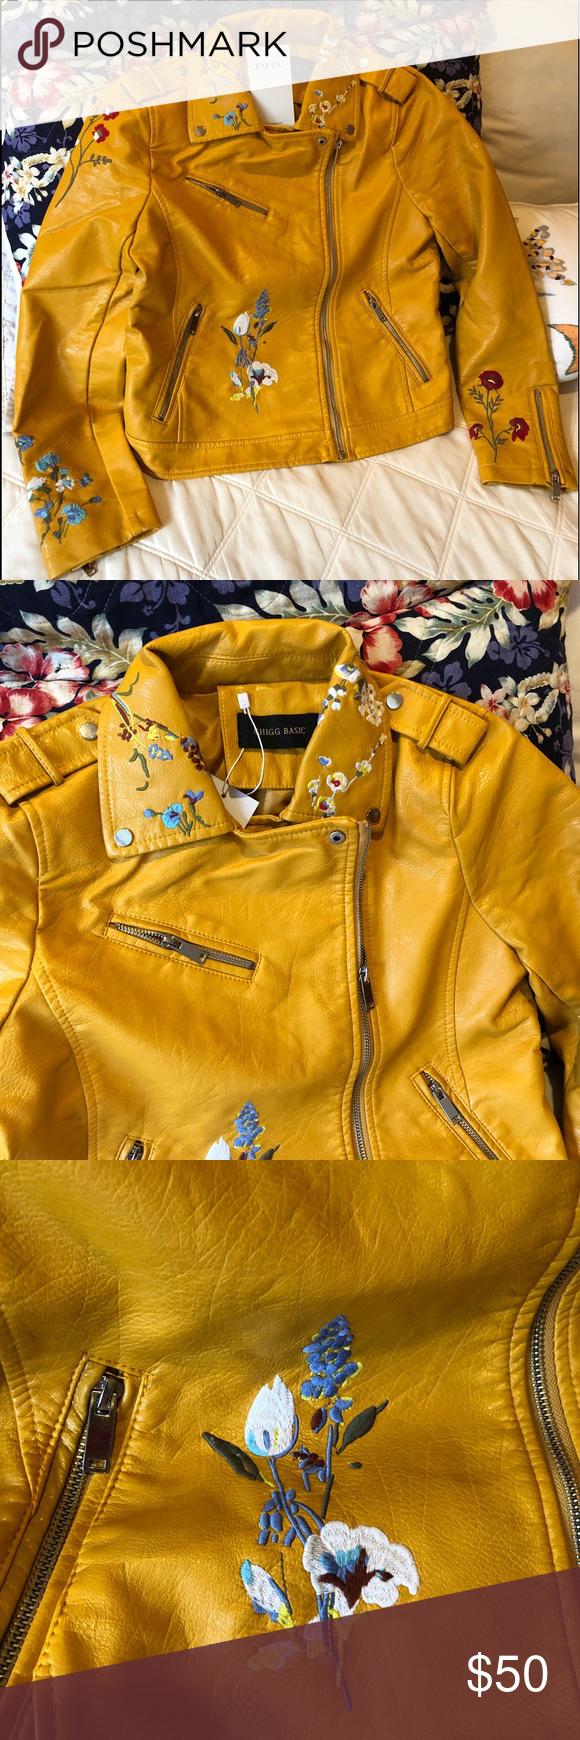 Zaful Embroidered Motorcycle Jacket Jackets, Pleather